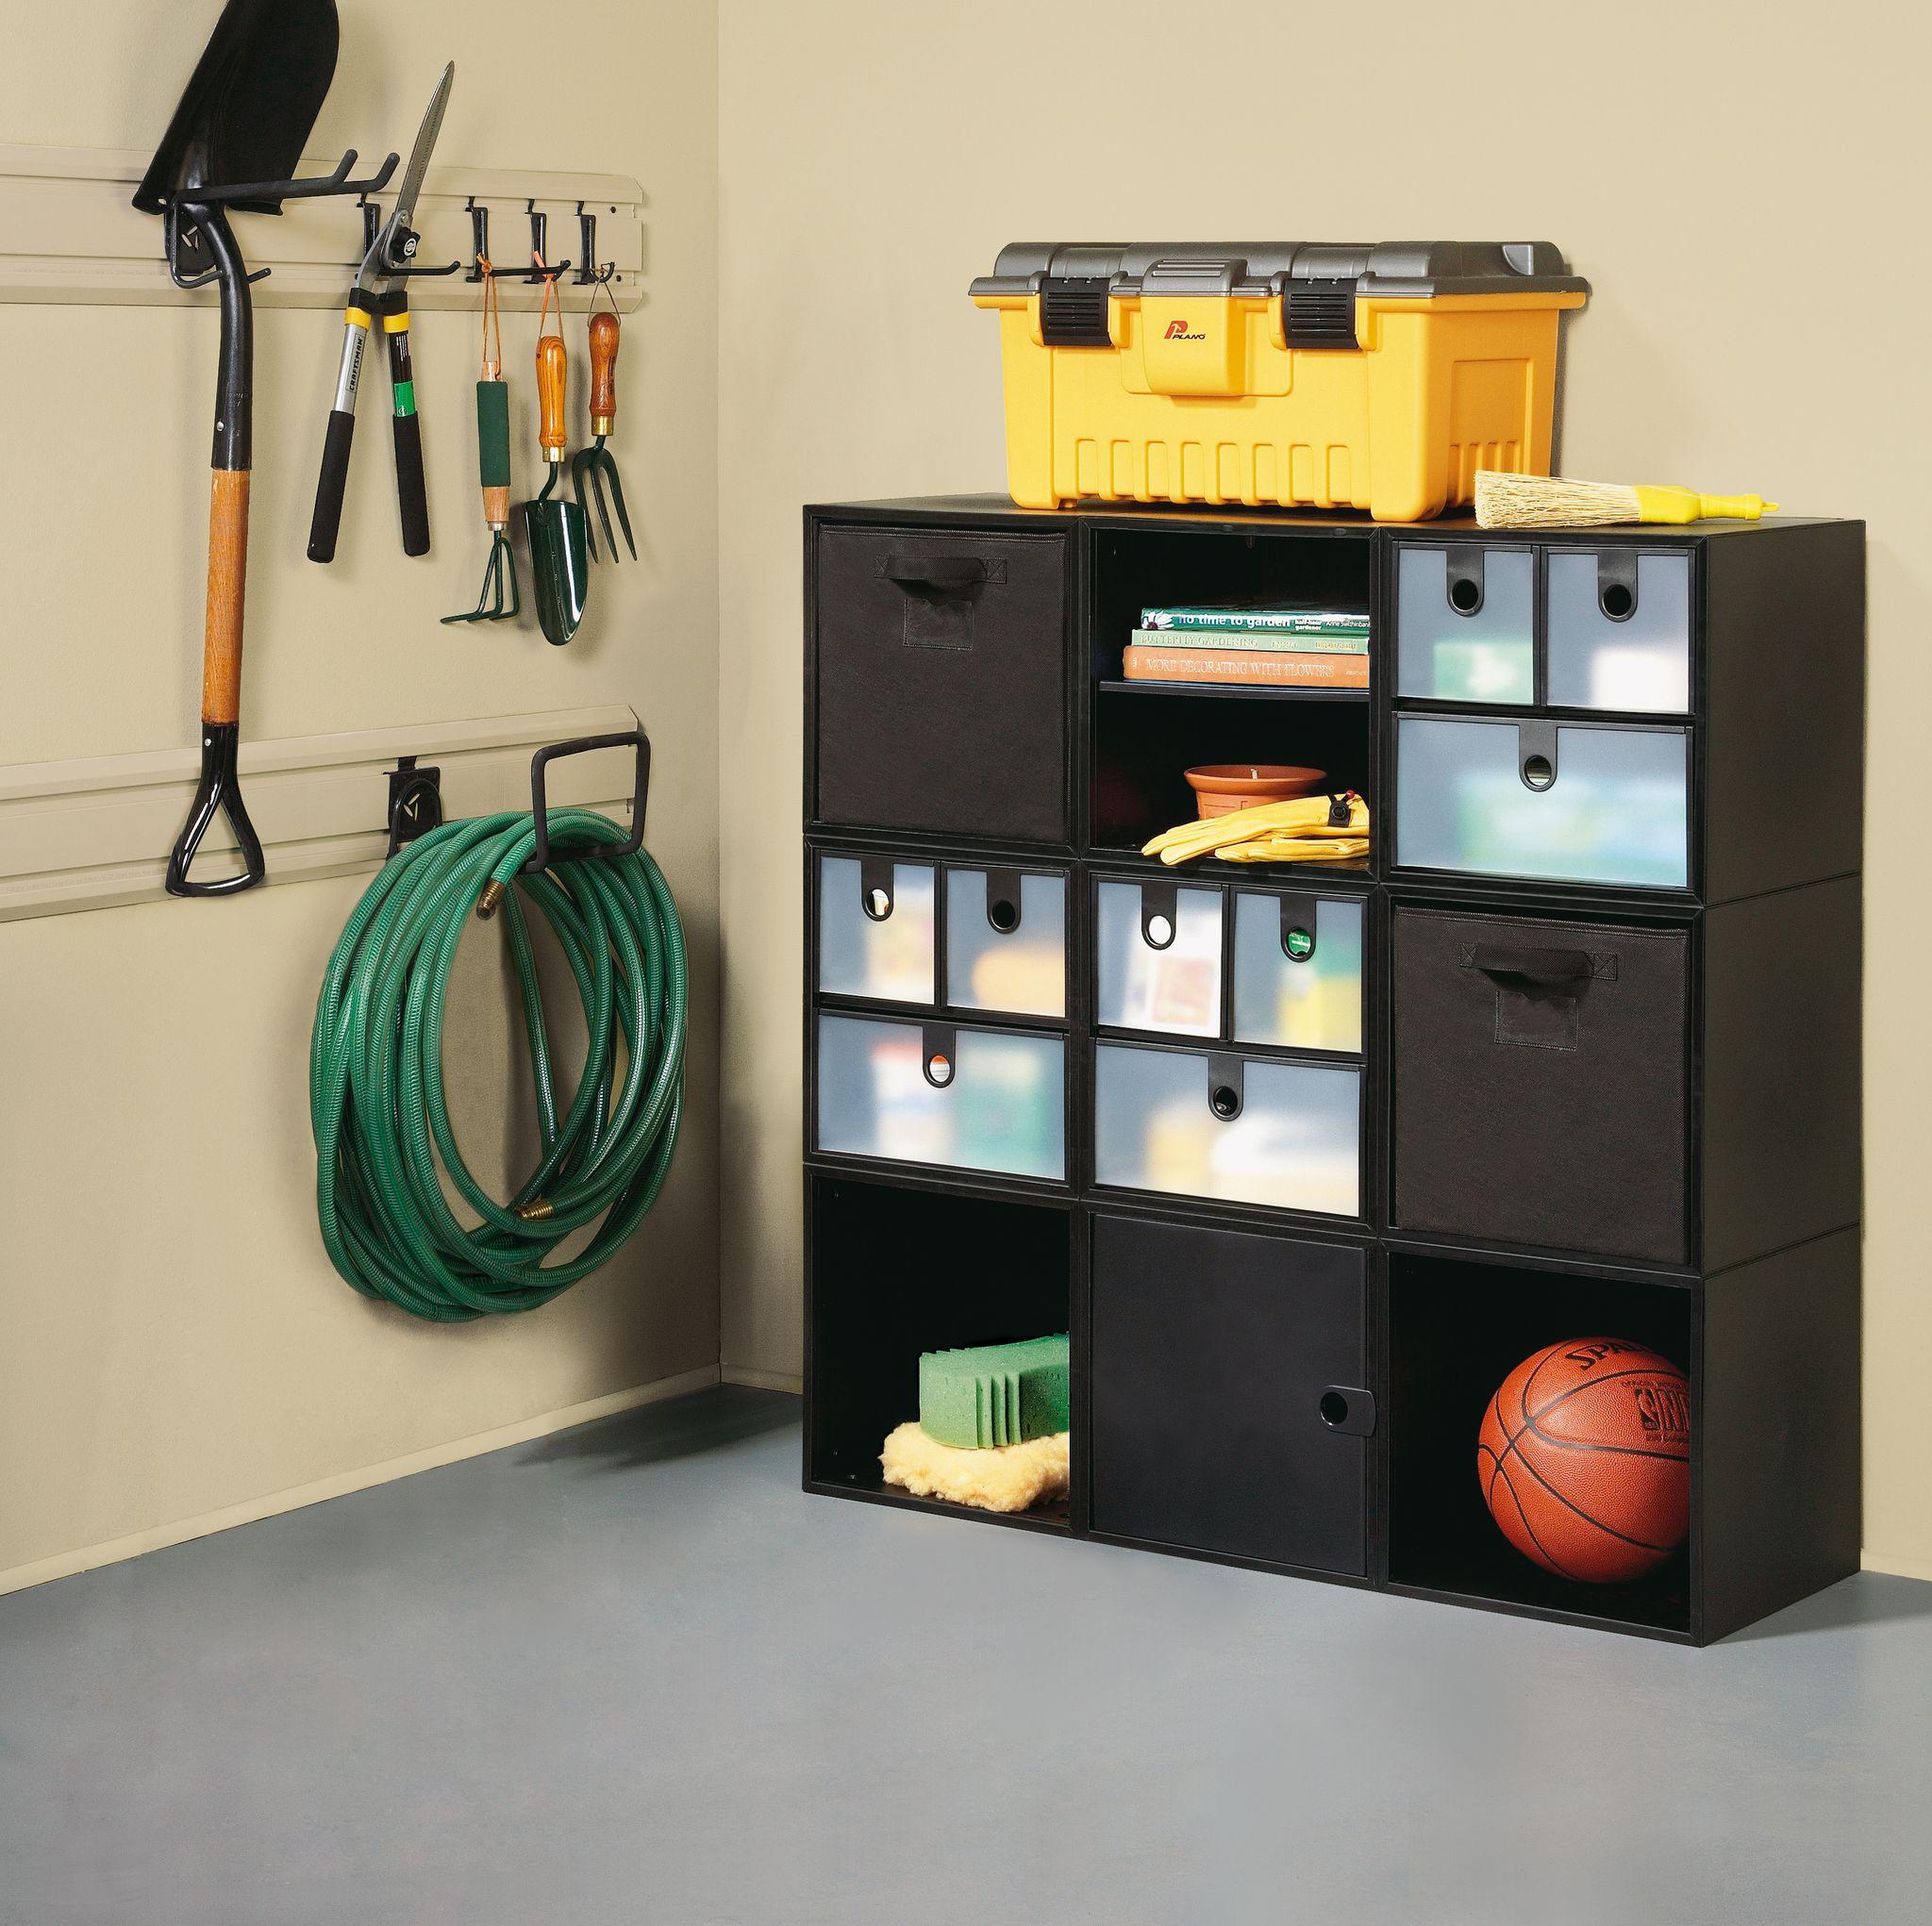 week organizing tips one heartwork for part finale organization garage